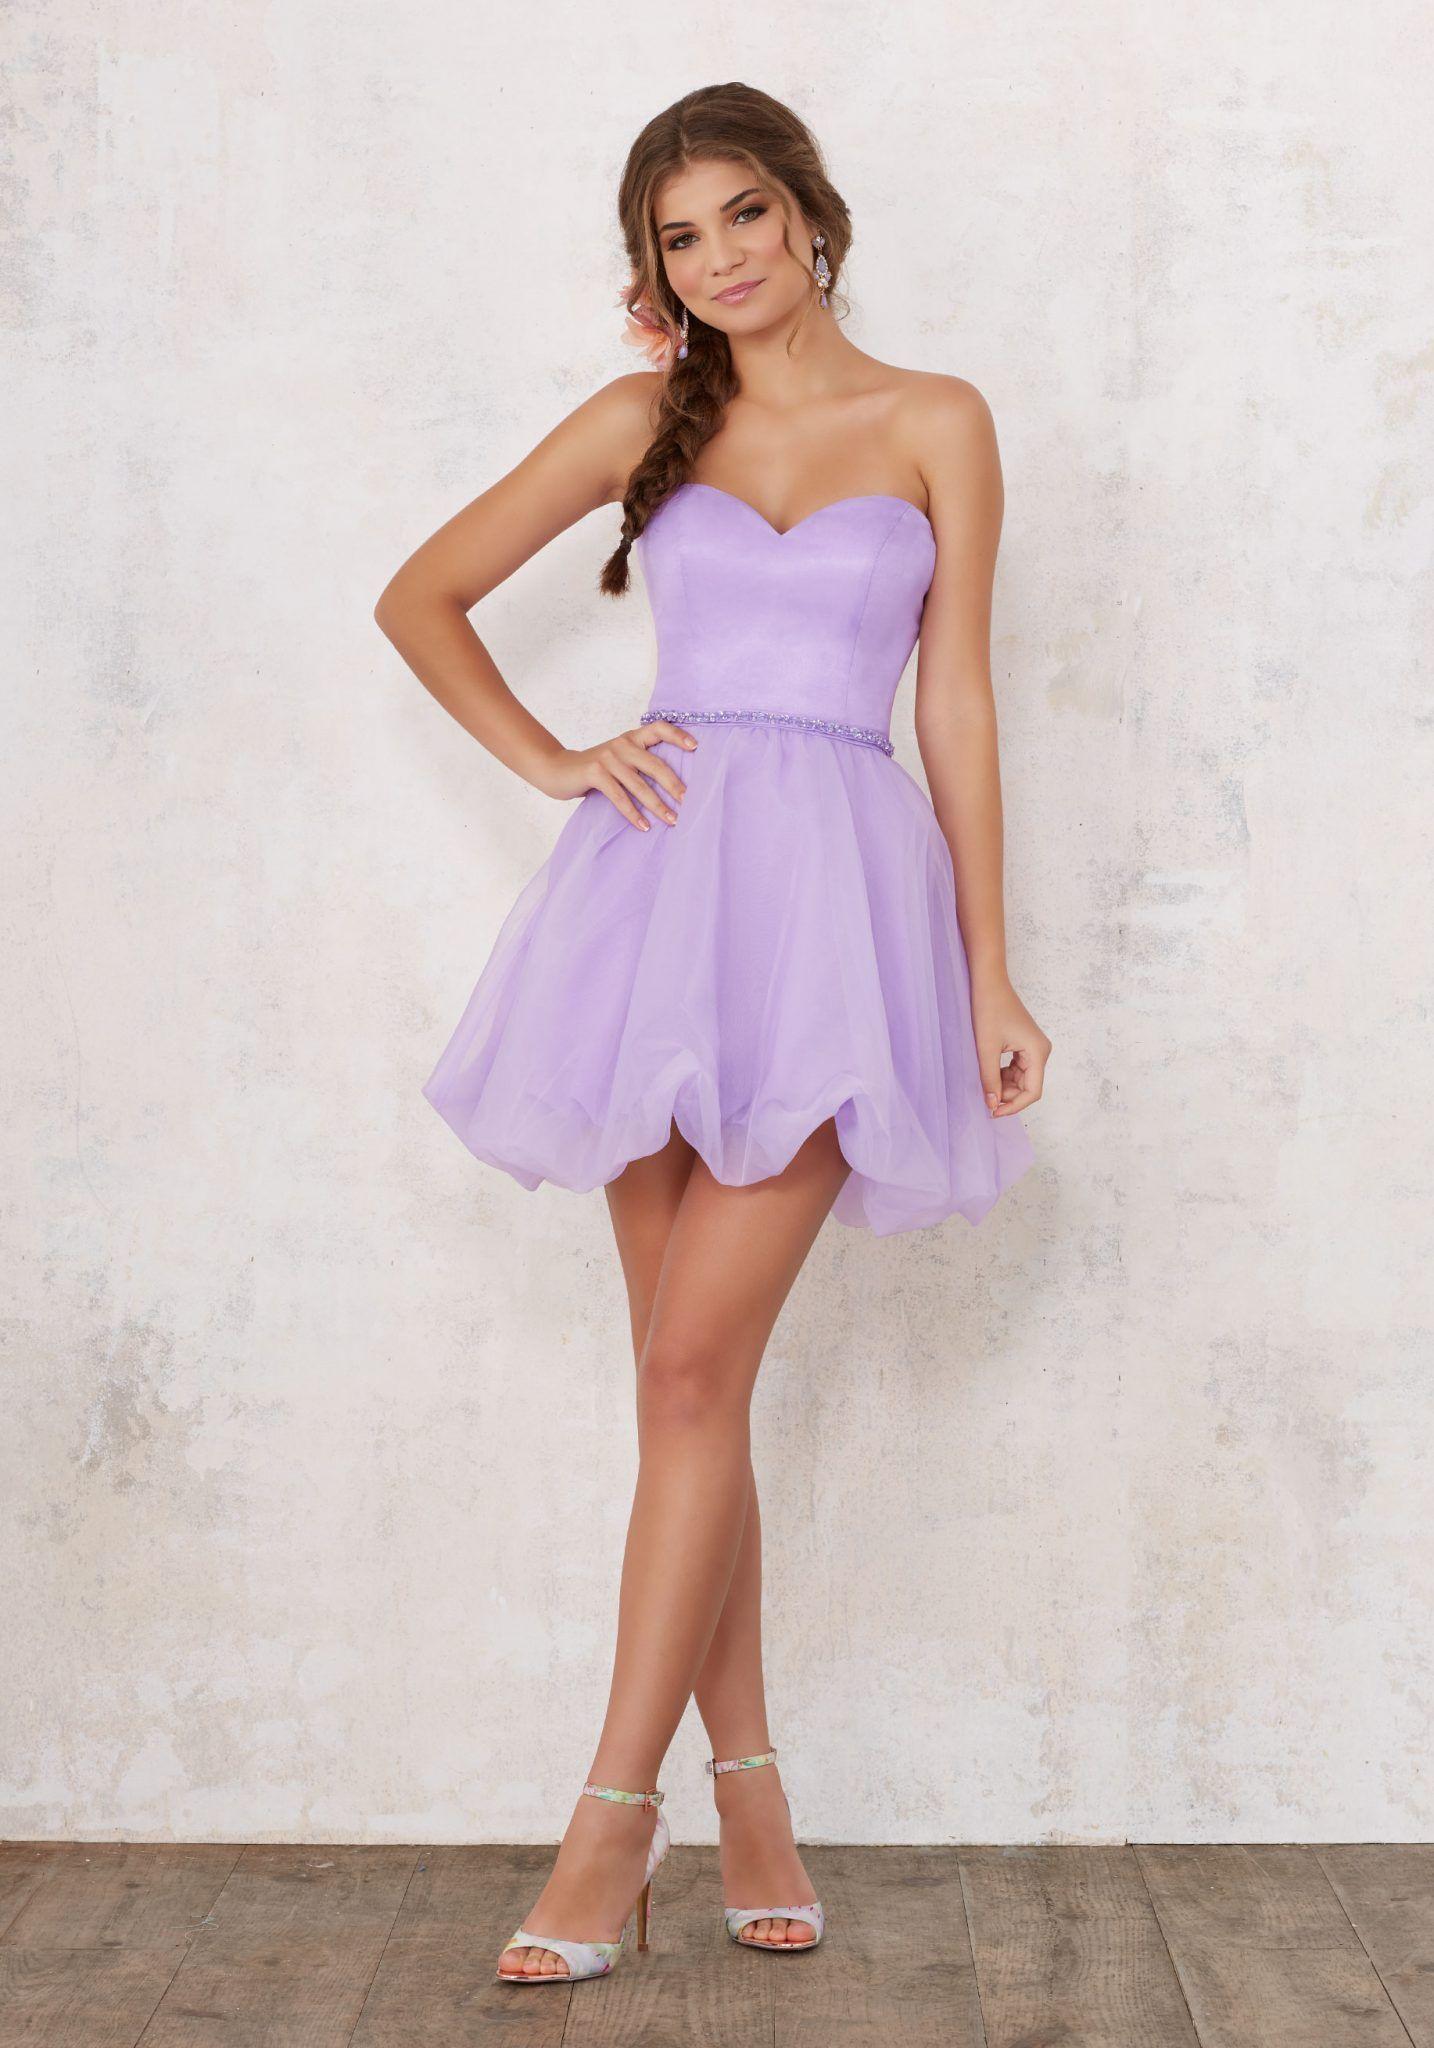 2020 Klos Abiye Elbise Kisa Gece Elbiseleri Eflatun Straplez Kabarik Etek Sade Ve Sik On Bes Yas Partisi Elbiseleri The Dress Quinceanera Dresses